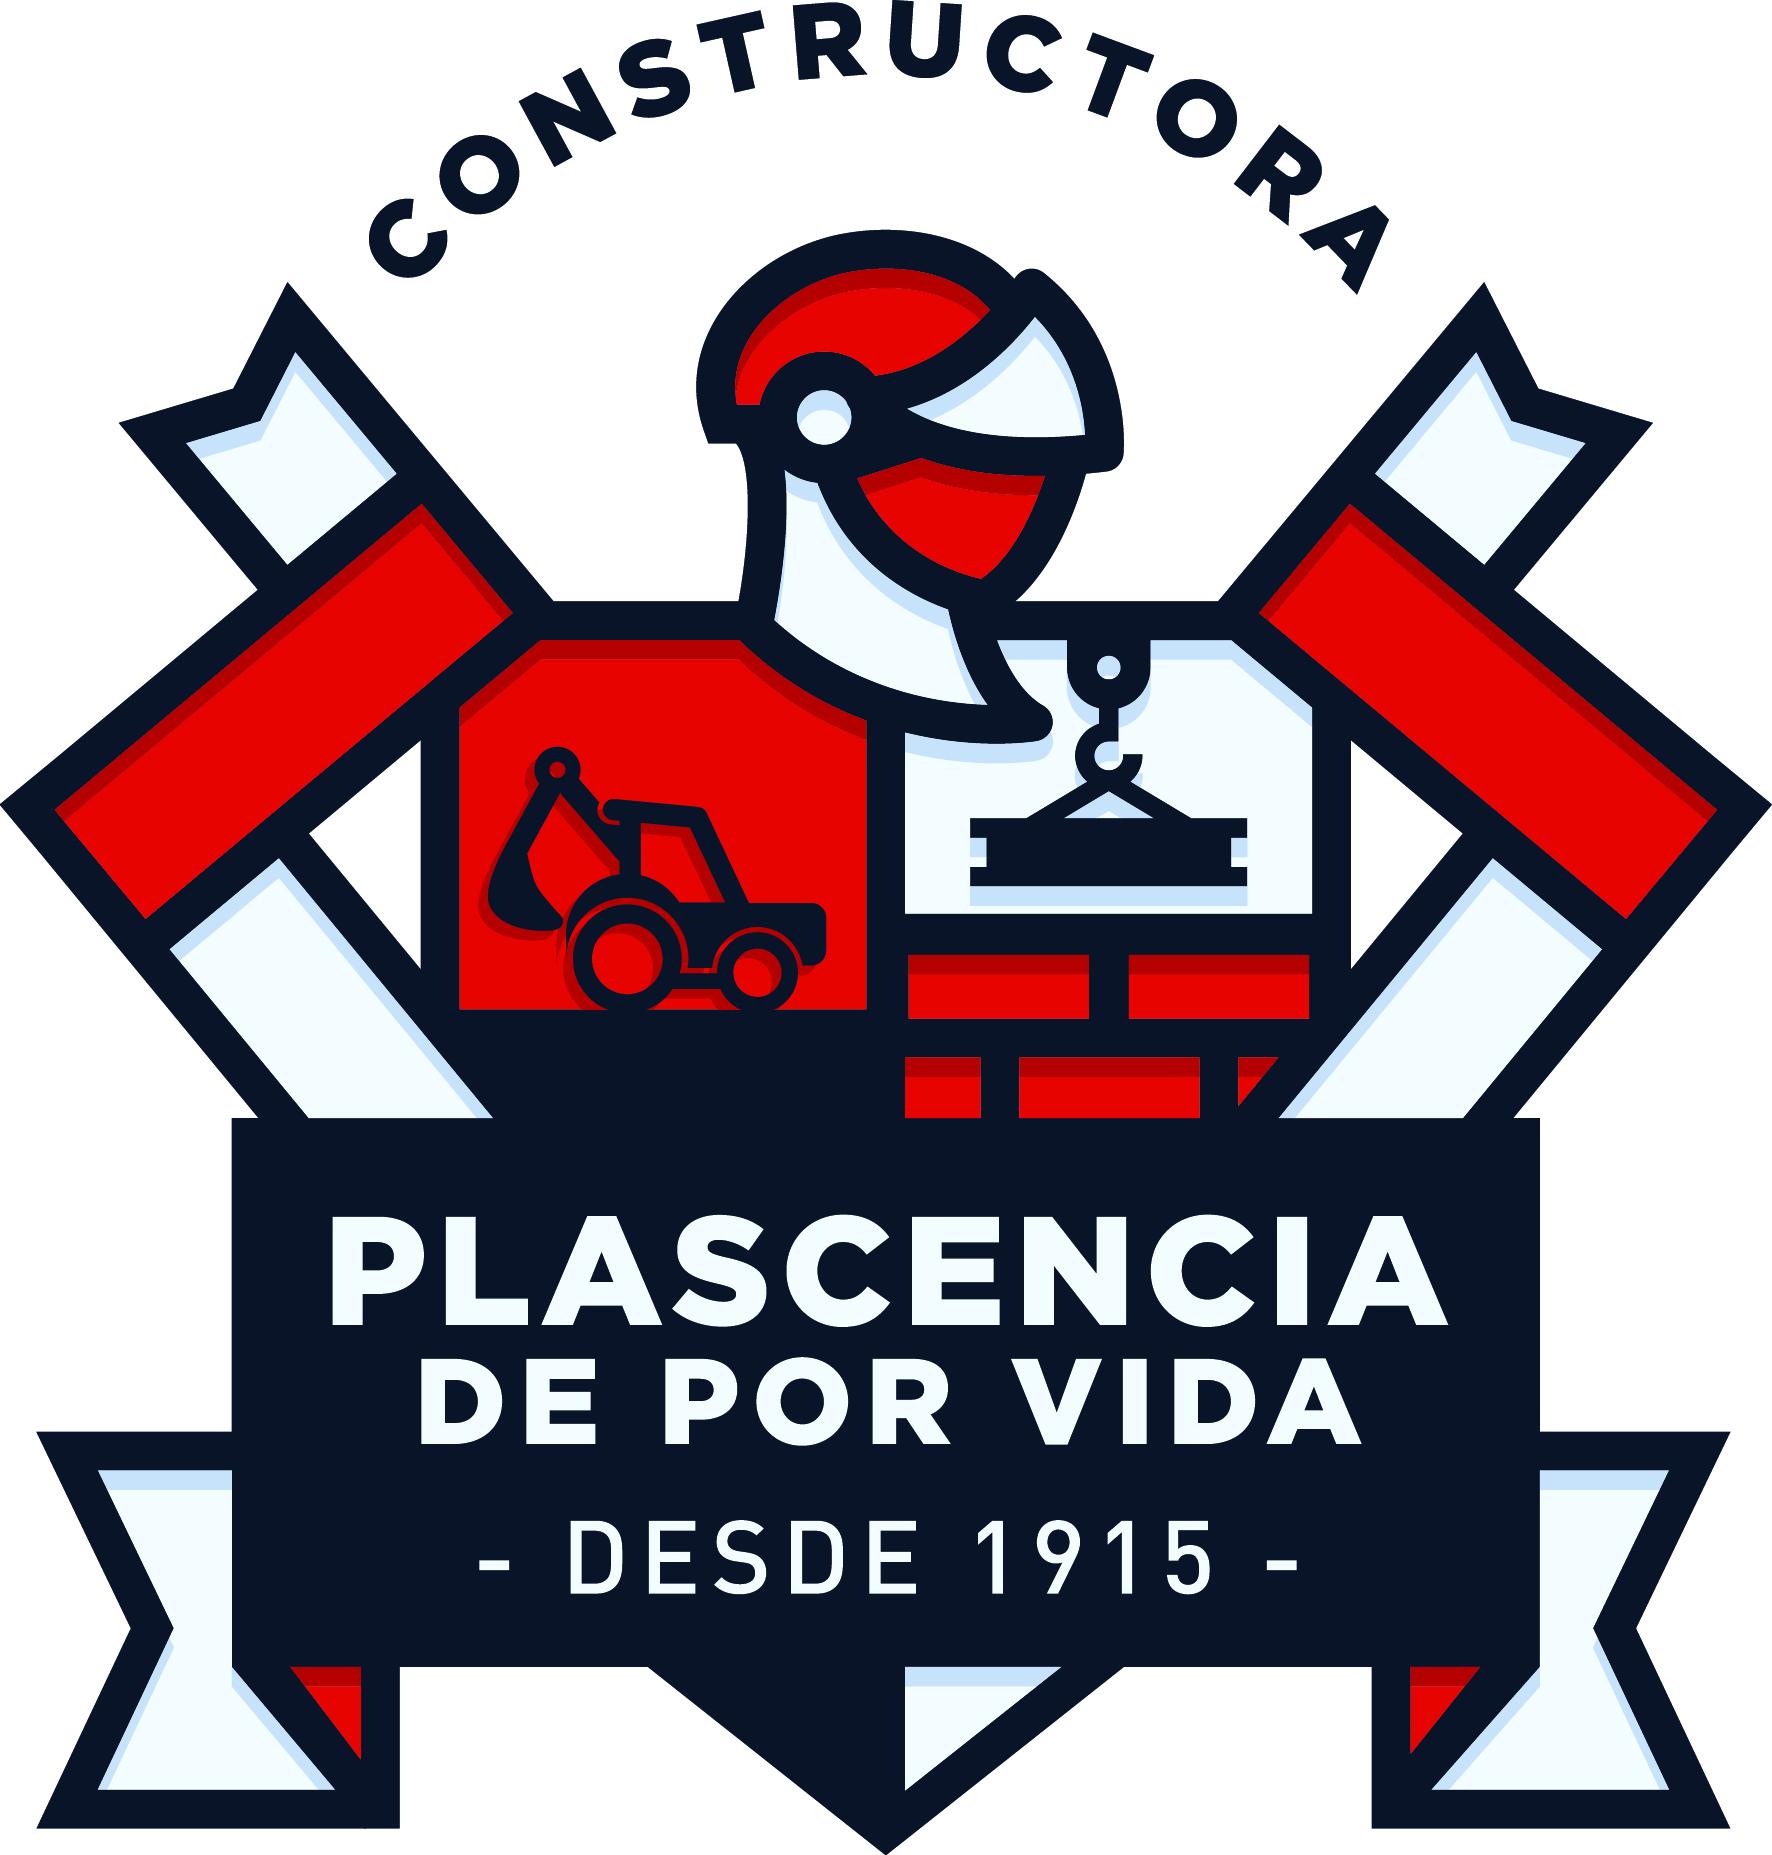 Constructora Plascencia